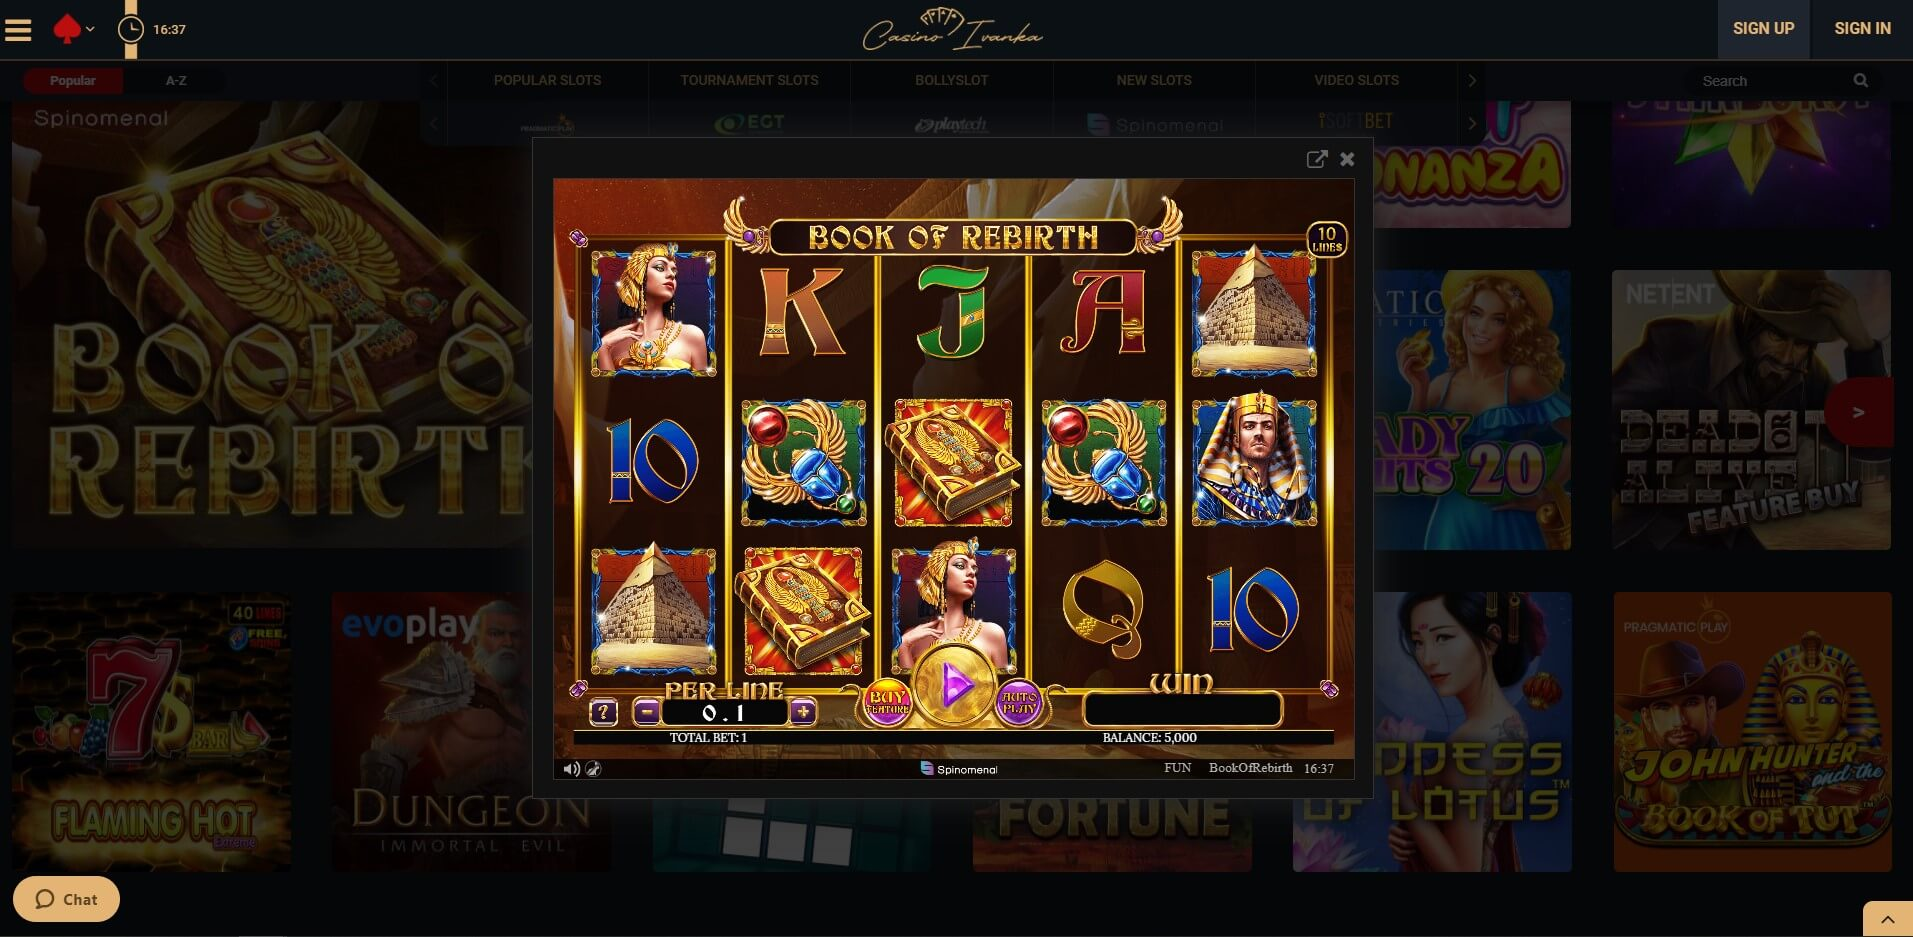 Game play at Ivanka Casino